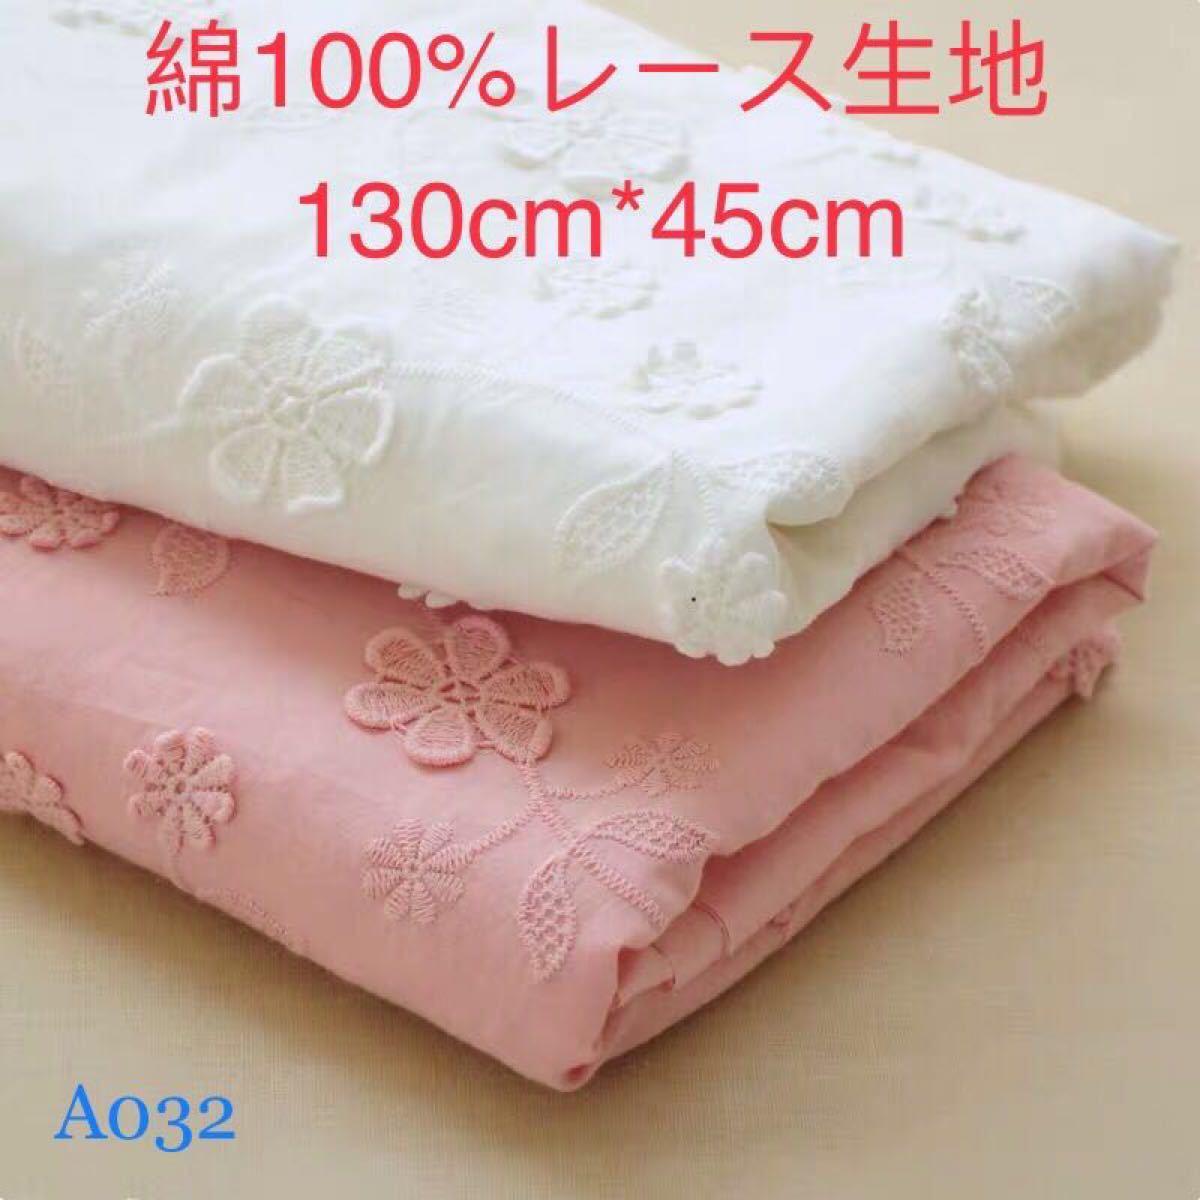 A032 綿100% カット 立体花柄 綿レース生地 130cm*45cm